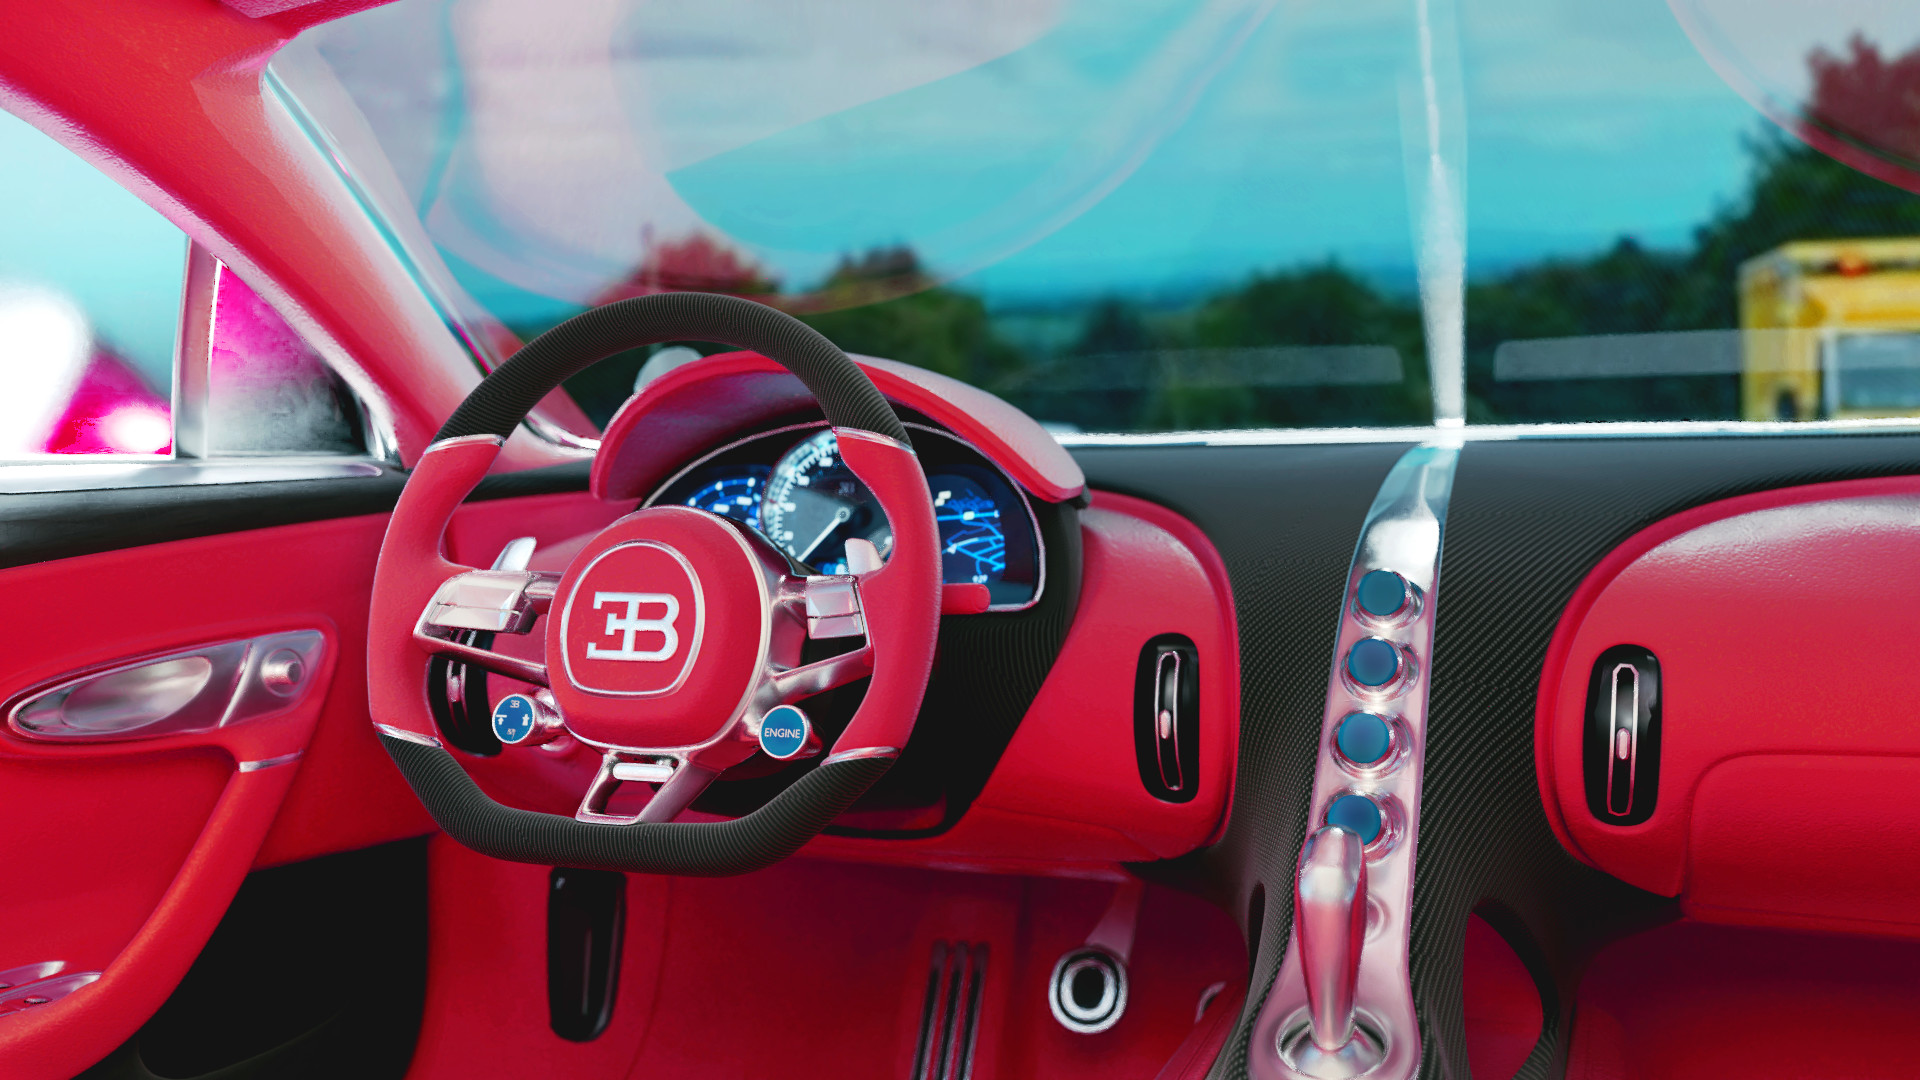 naman deep - bugatti chiron with interior